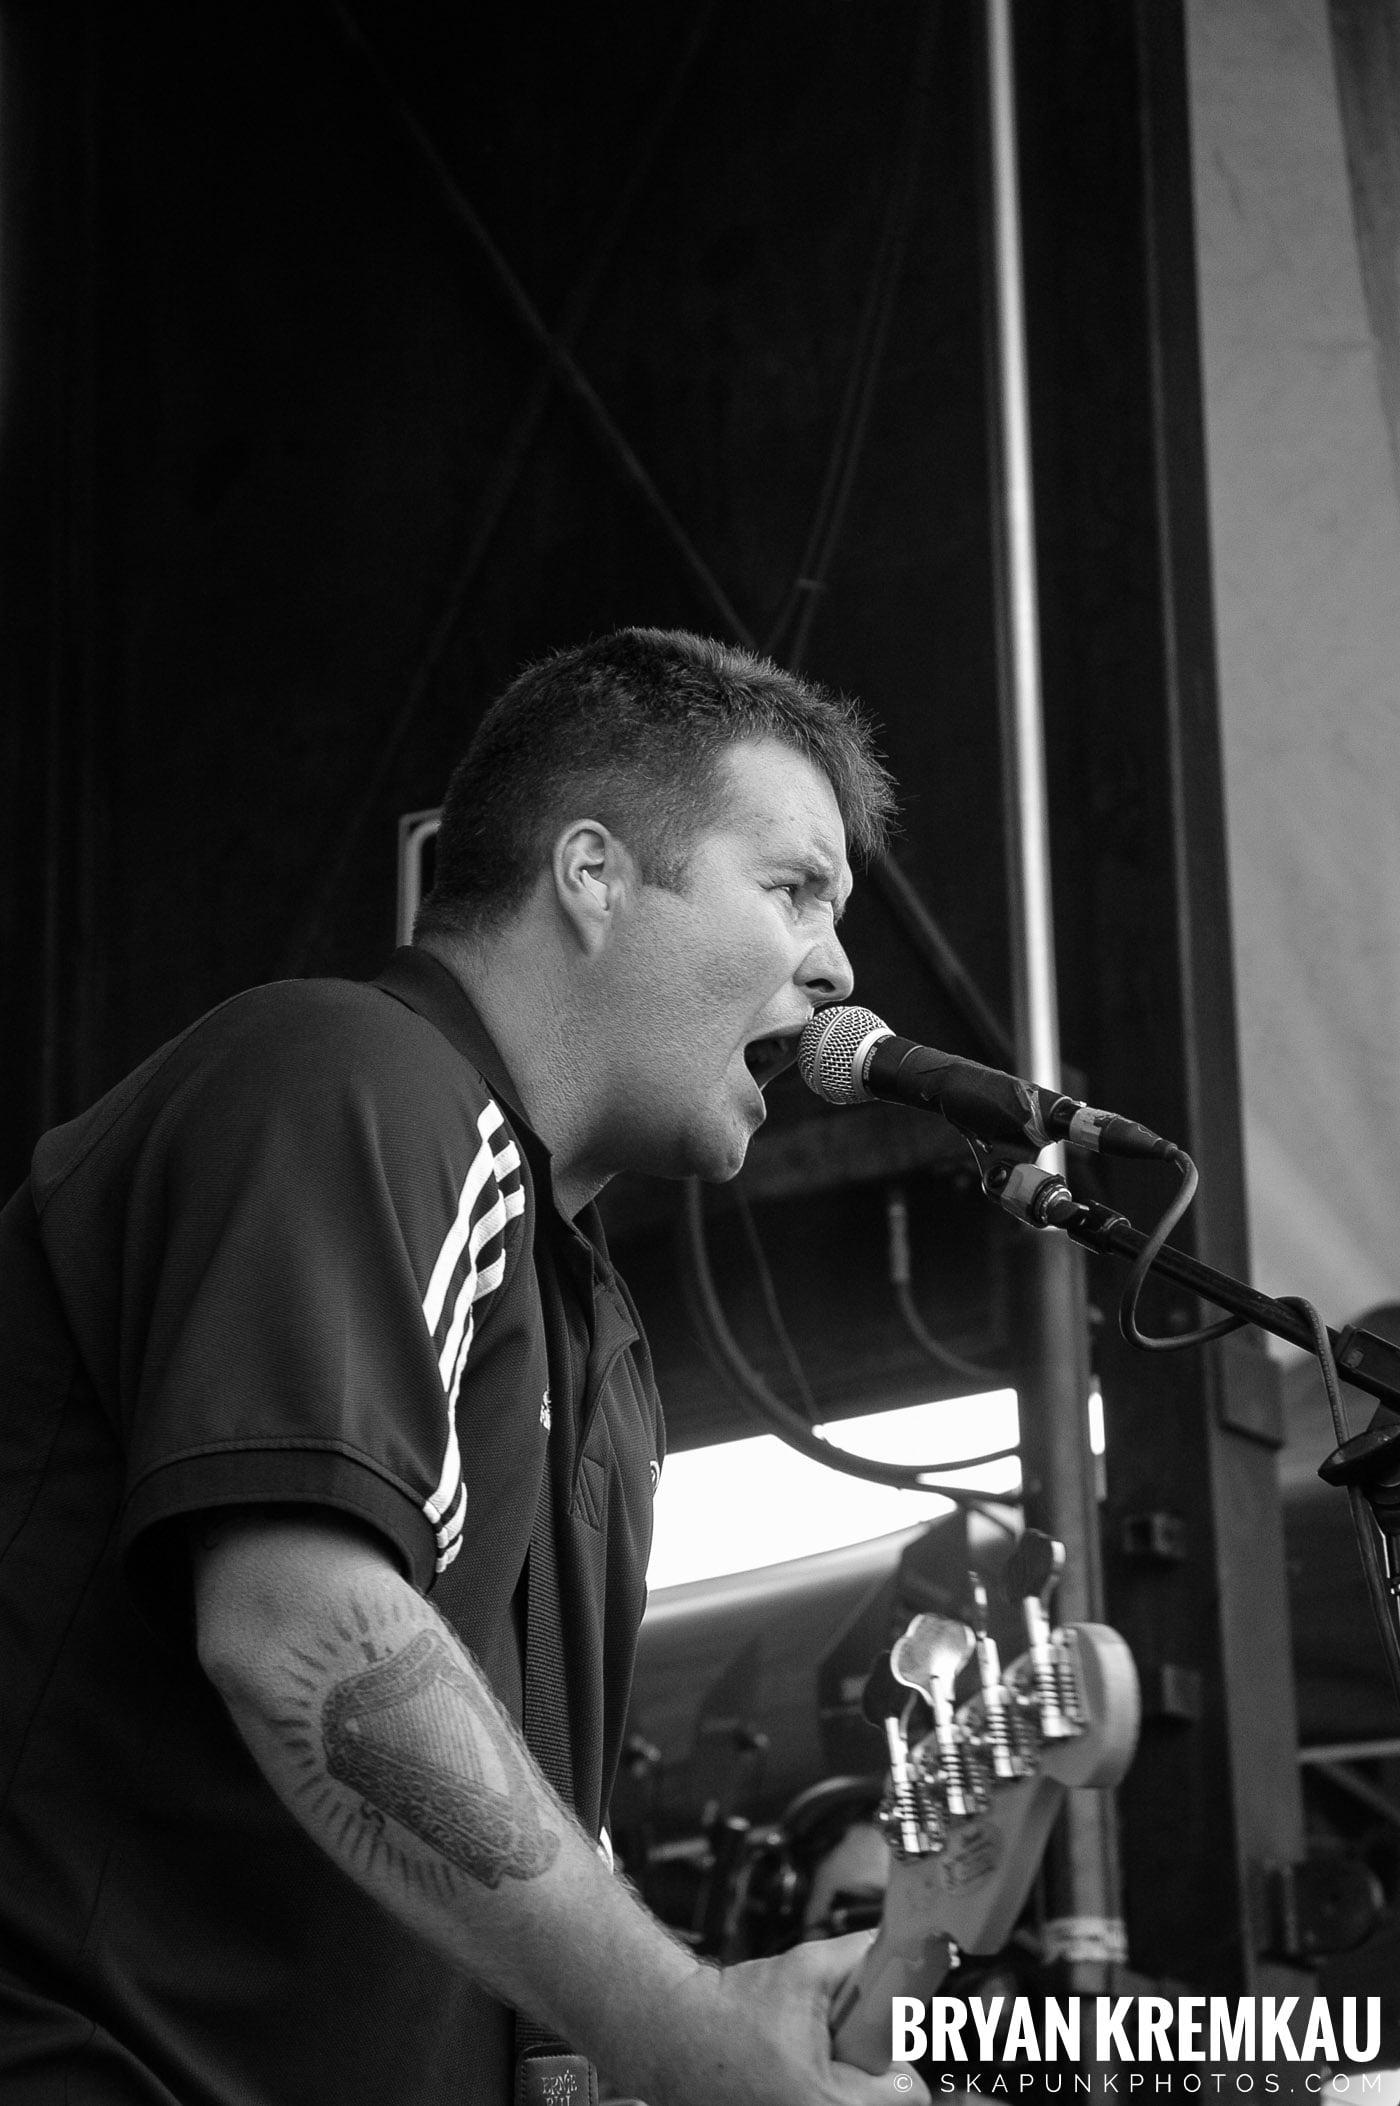 Dropkick Murphys @ Warped Tour 05, NYC - 8.12.05 (9)